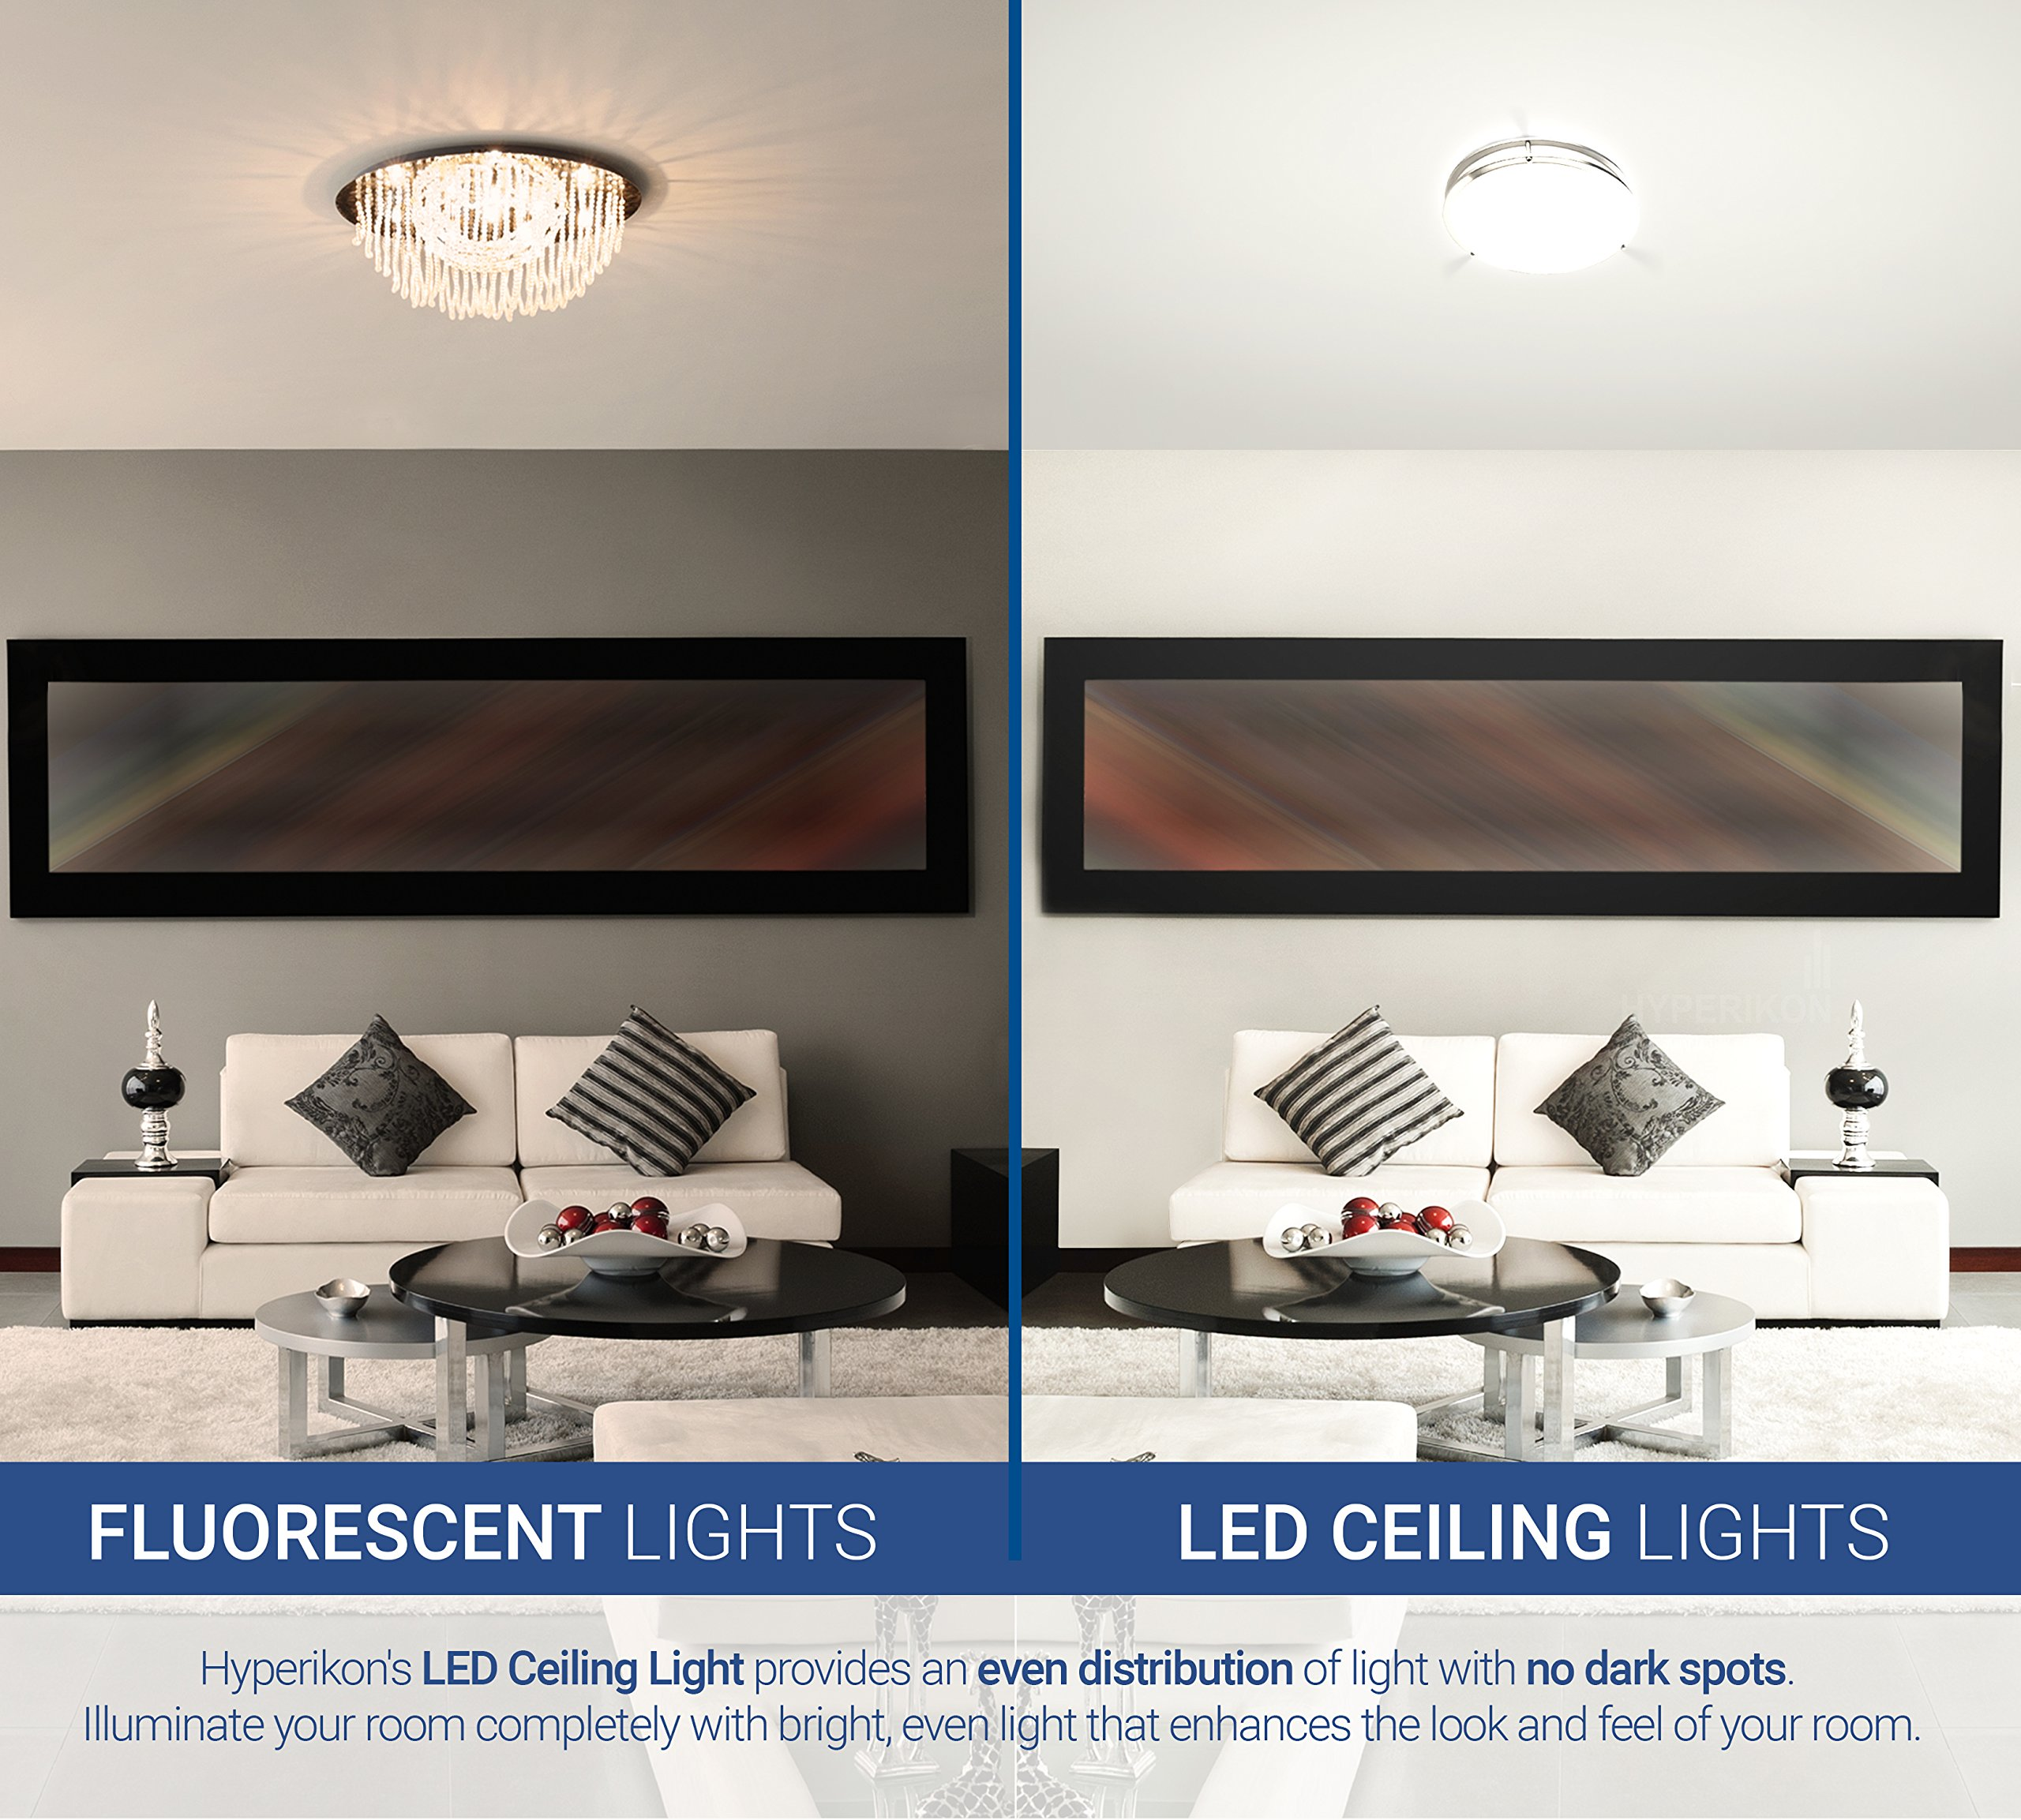 Hyperikon LED Flush Mount Ceiling Light, 14'', 100W equivalent, 1980lm, 4000K (Daylight Glow), 120V, 14-Inch, Dimmable by Hyperikon (Image #5)